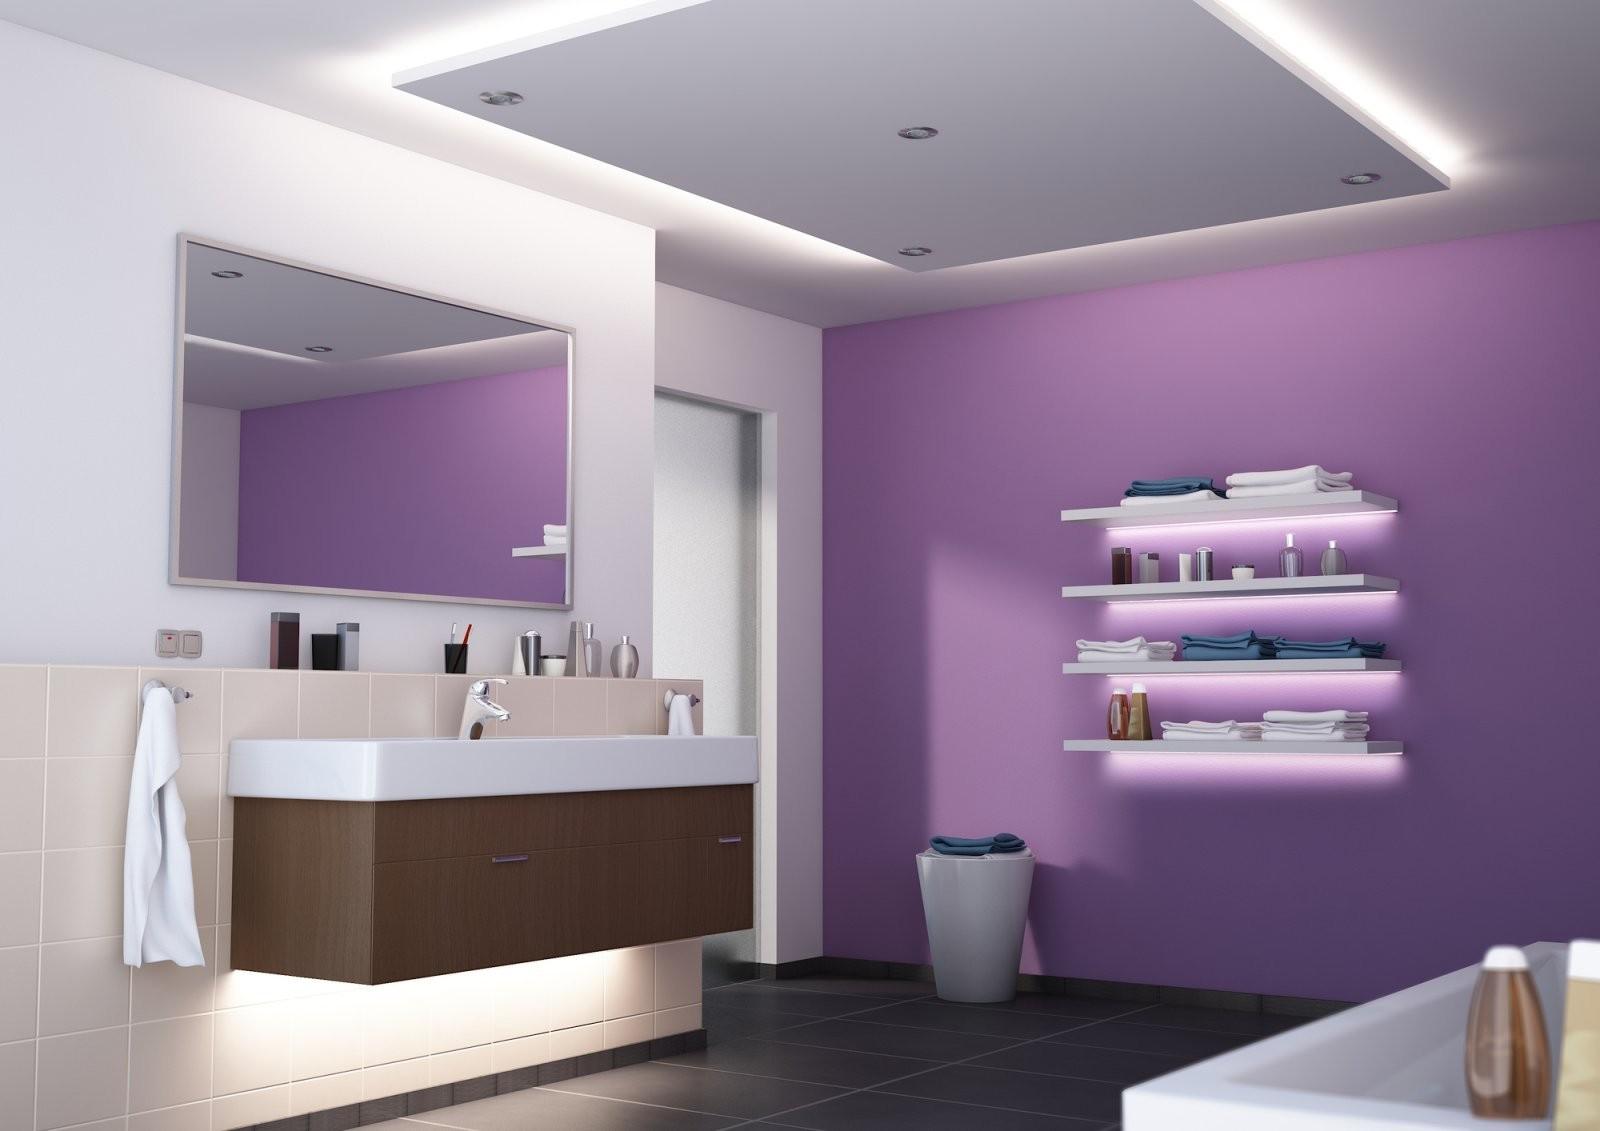 Ledbeleuchtung Im Bad Wellness Im Badezimmer Mit Ledstrips von Led Leinwandbild Selber Machen Photo